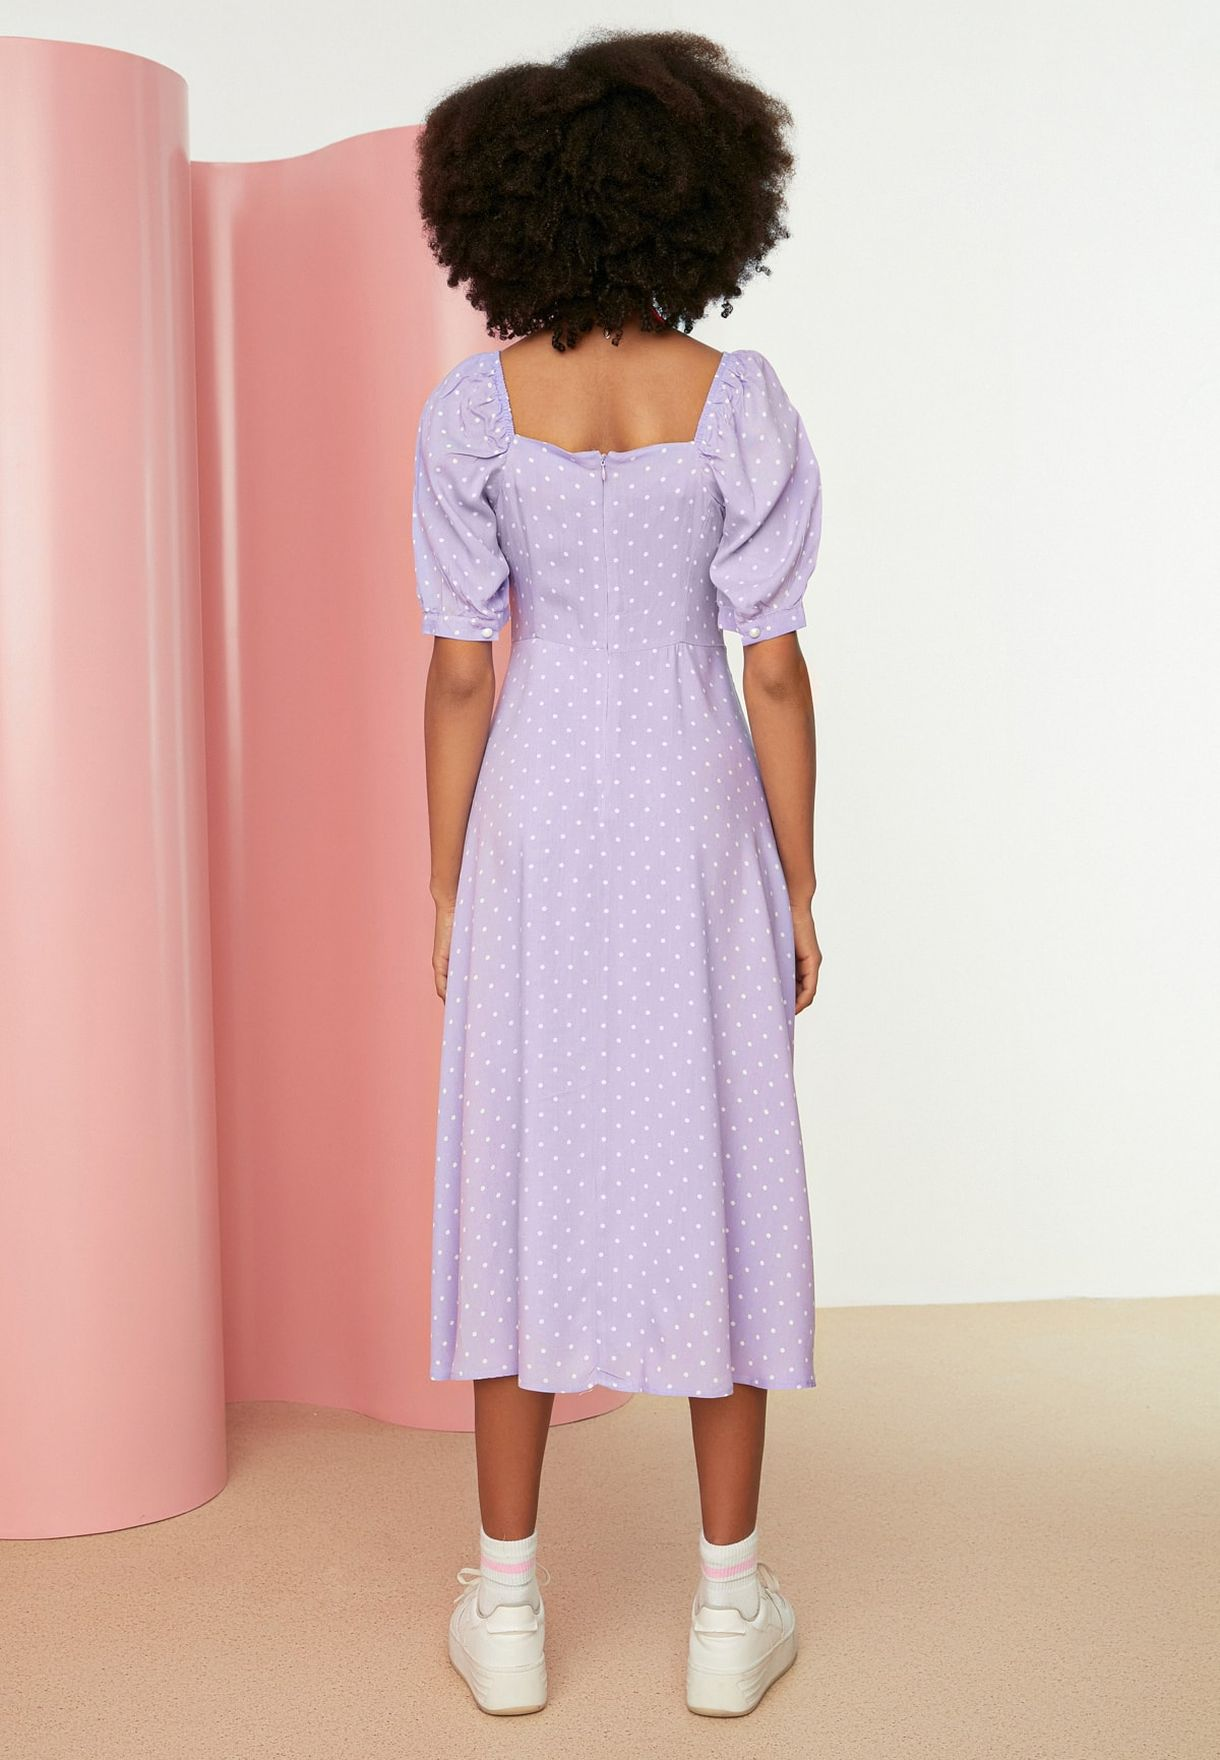 Puff Sleeve Polka Dot Dress